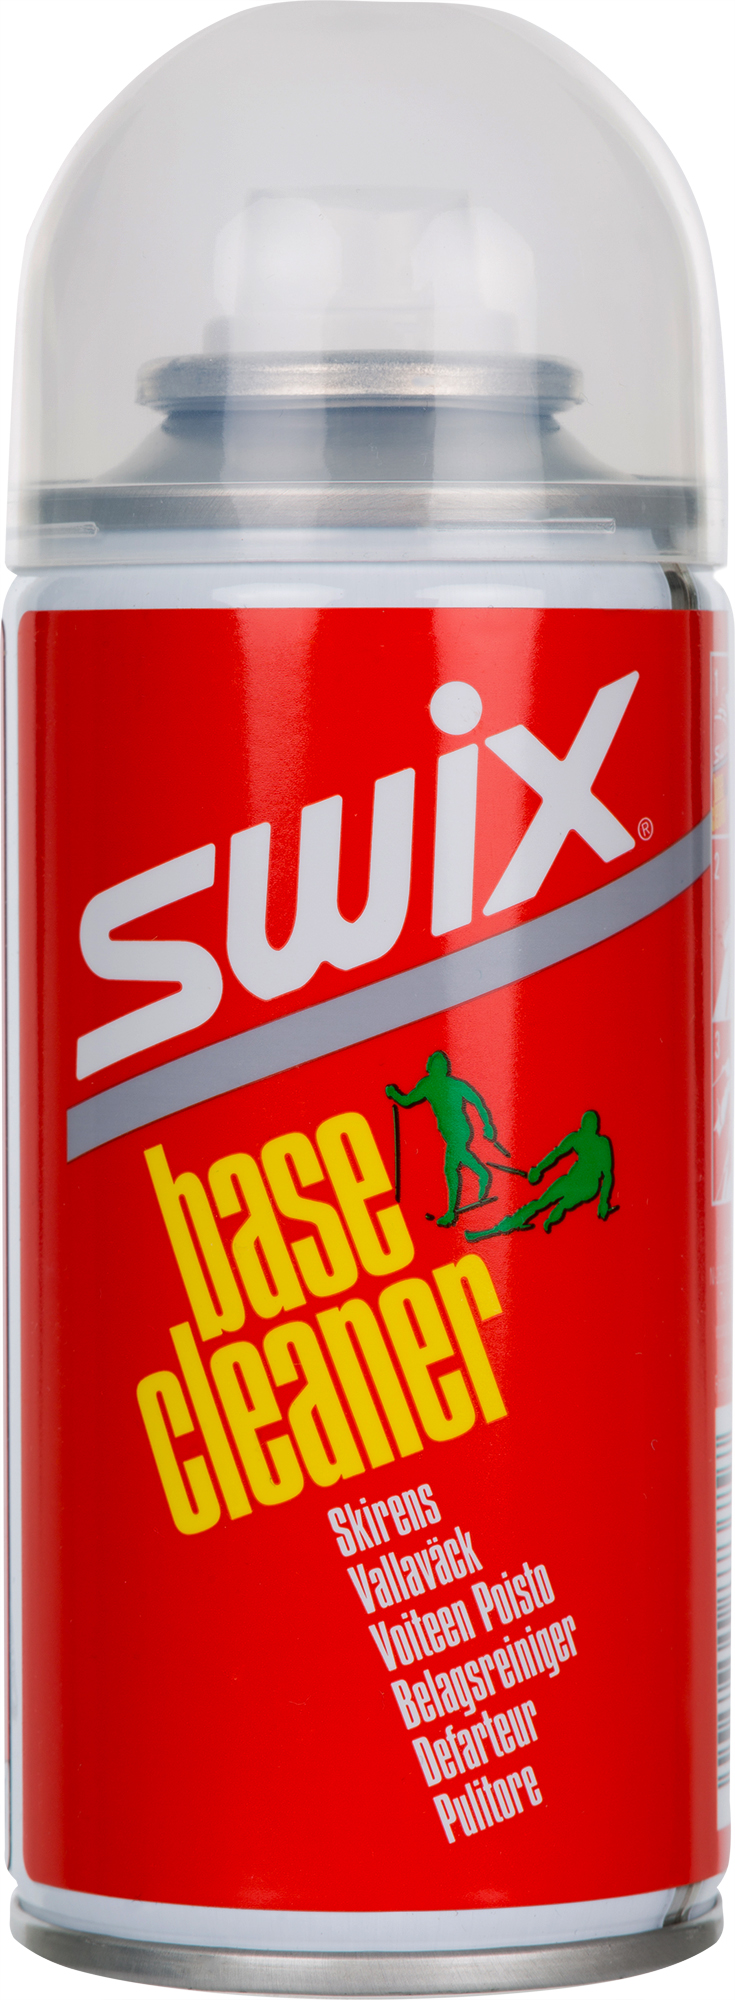 Swix Смывка Swix, размер Без размера swix стальная щетка средней жесткости swix